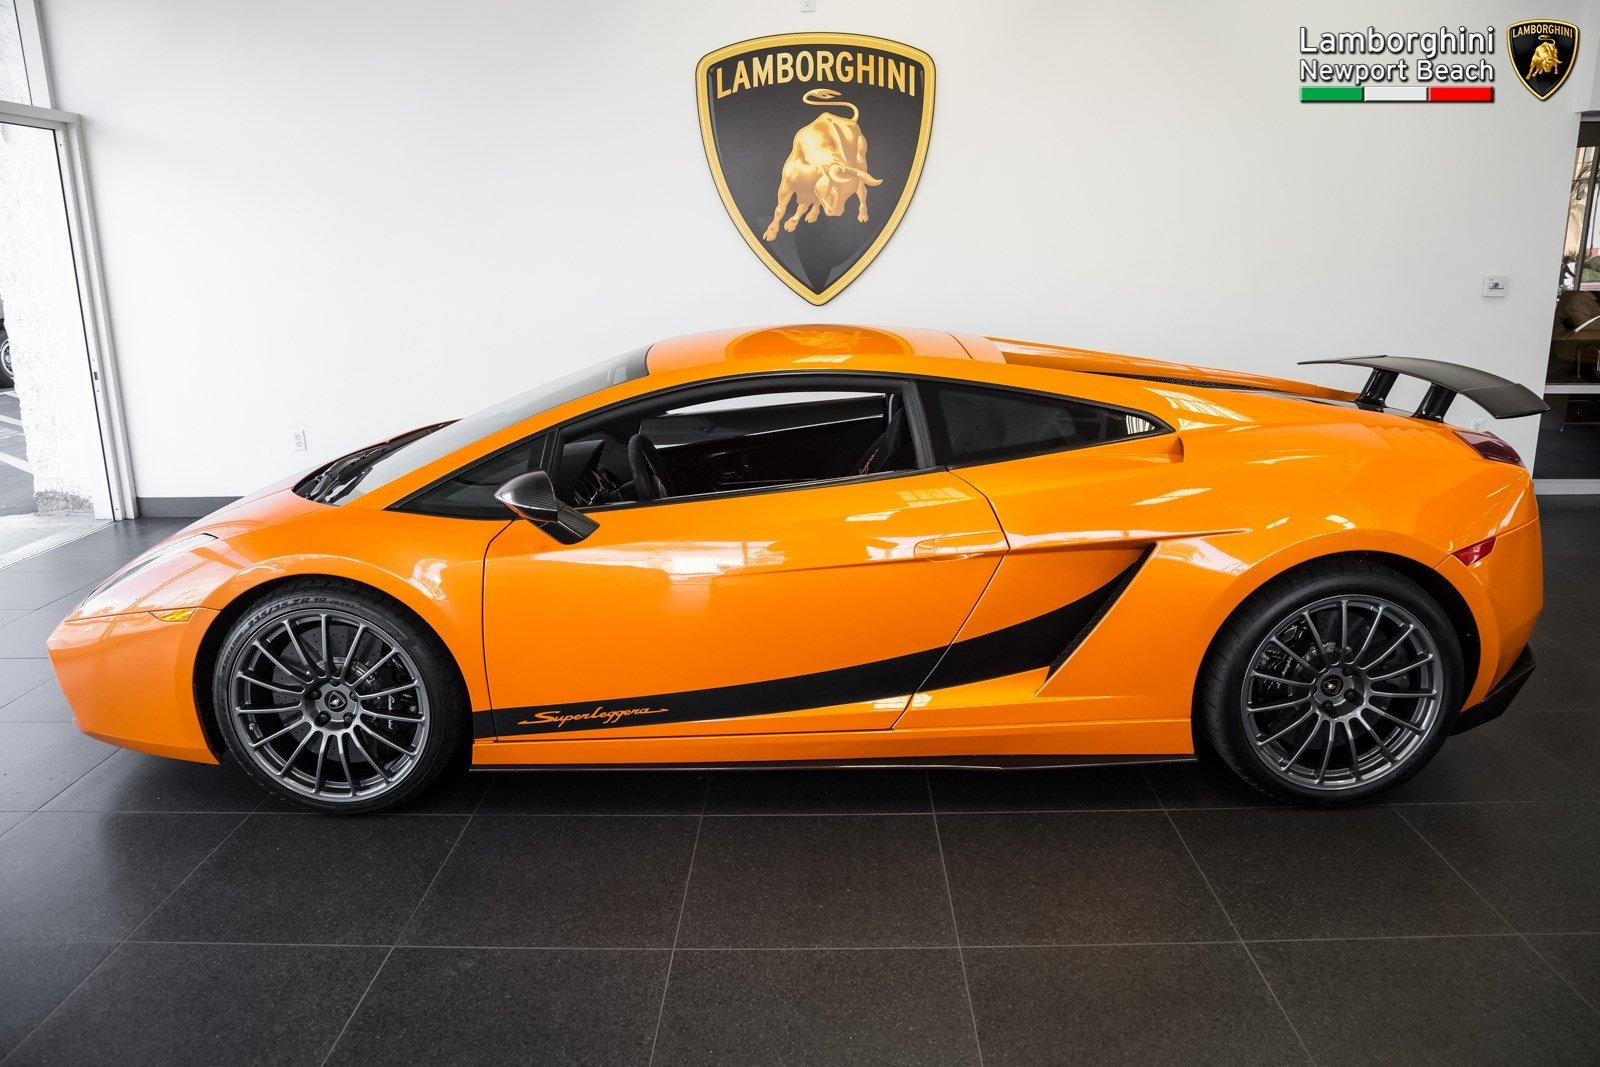 2008 lamborghini gallardo superleggera cars orange. Black Bedroom Furniture Sets. Home Design Ideas